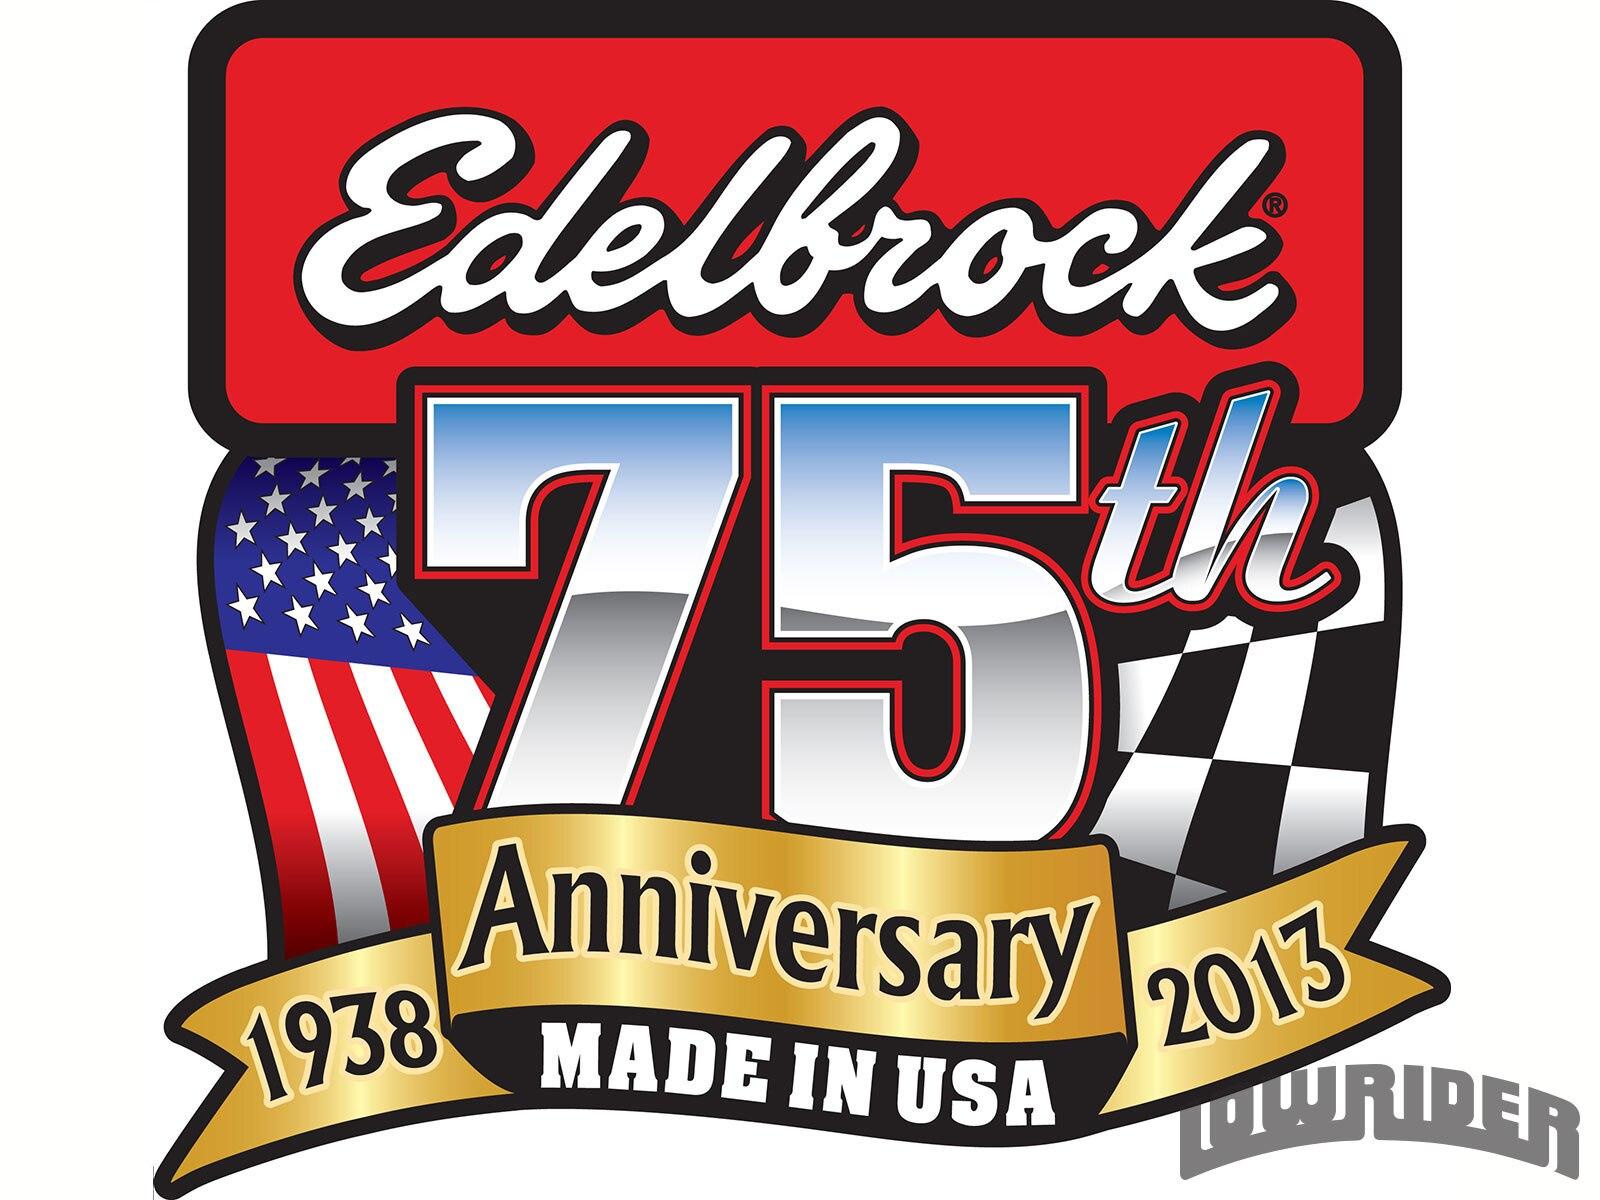 1304-lrmp-10-o-edelbrock-corporation-75th-anniversary-edelbrock-anniversary-banner